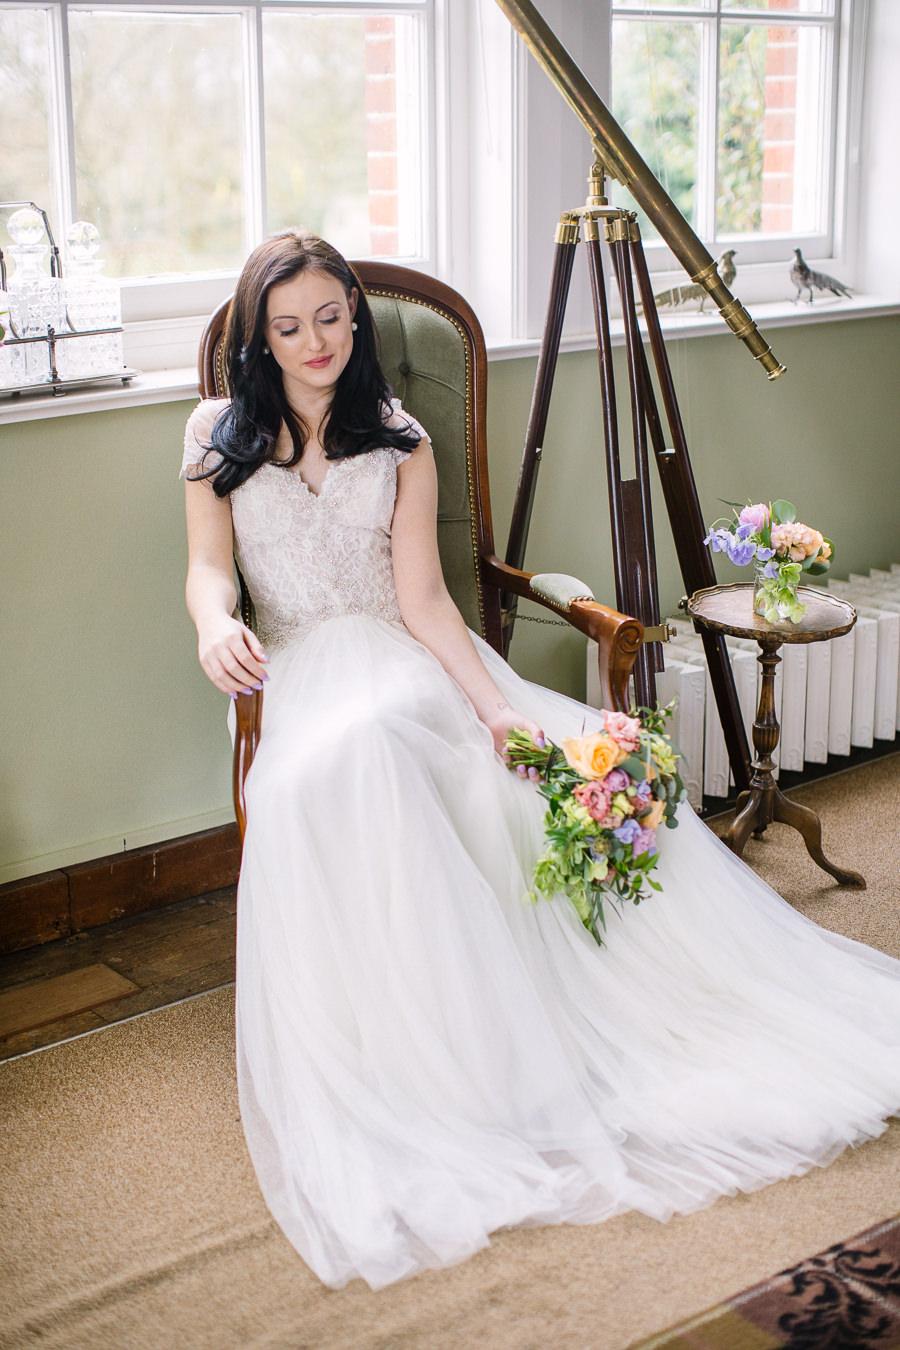 'Understated Elegance' Spring Styled Hampshire Bridal Shoot – Rownhams House, photo credit Nisha Haq Photography (5)